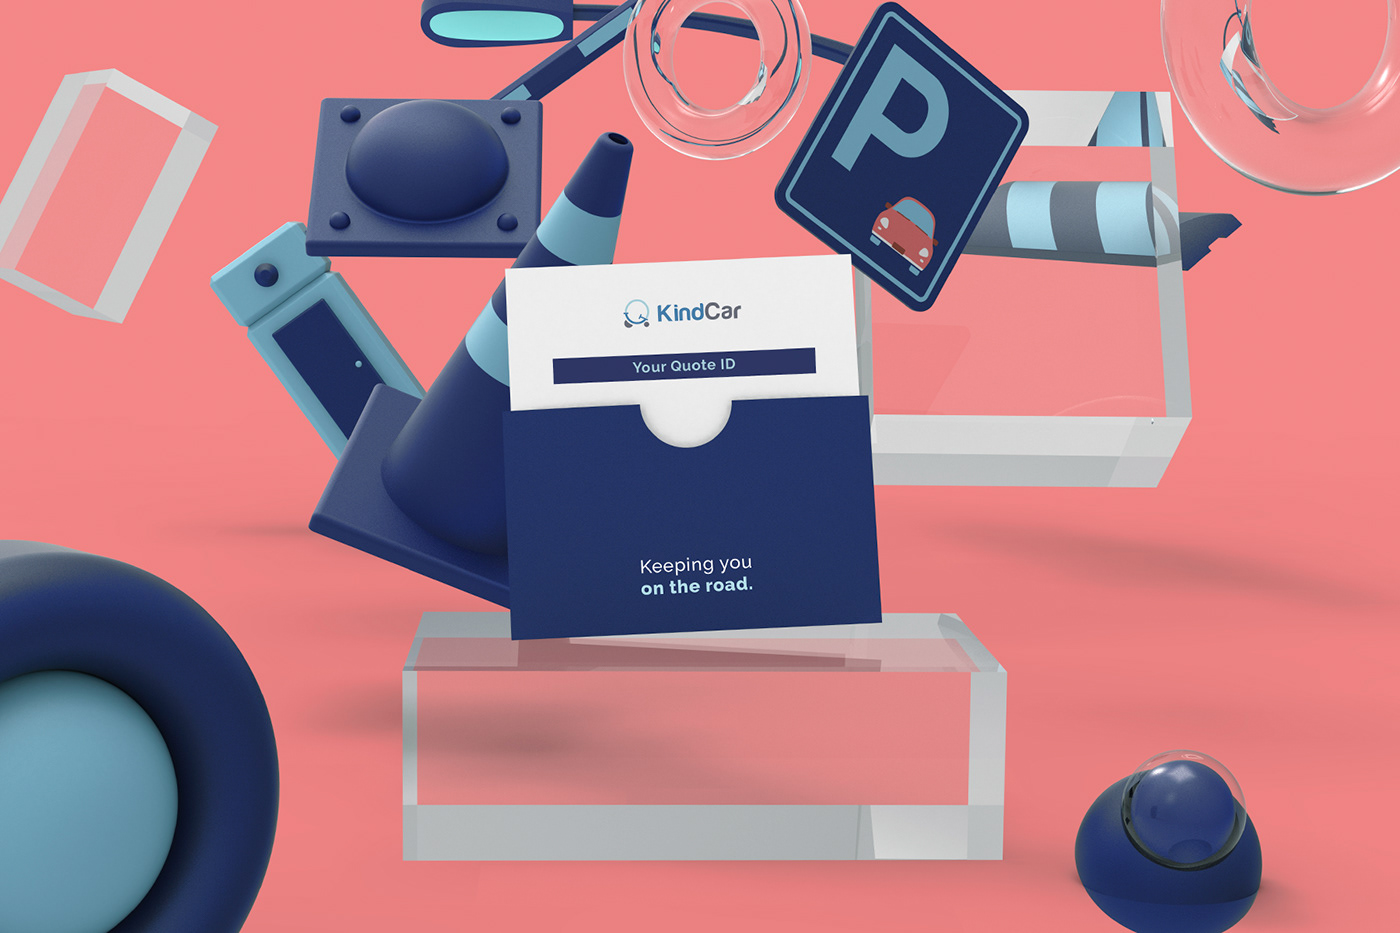 design branding  brand art direction  graphic design  ILLUSTRATION  Render 3D car